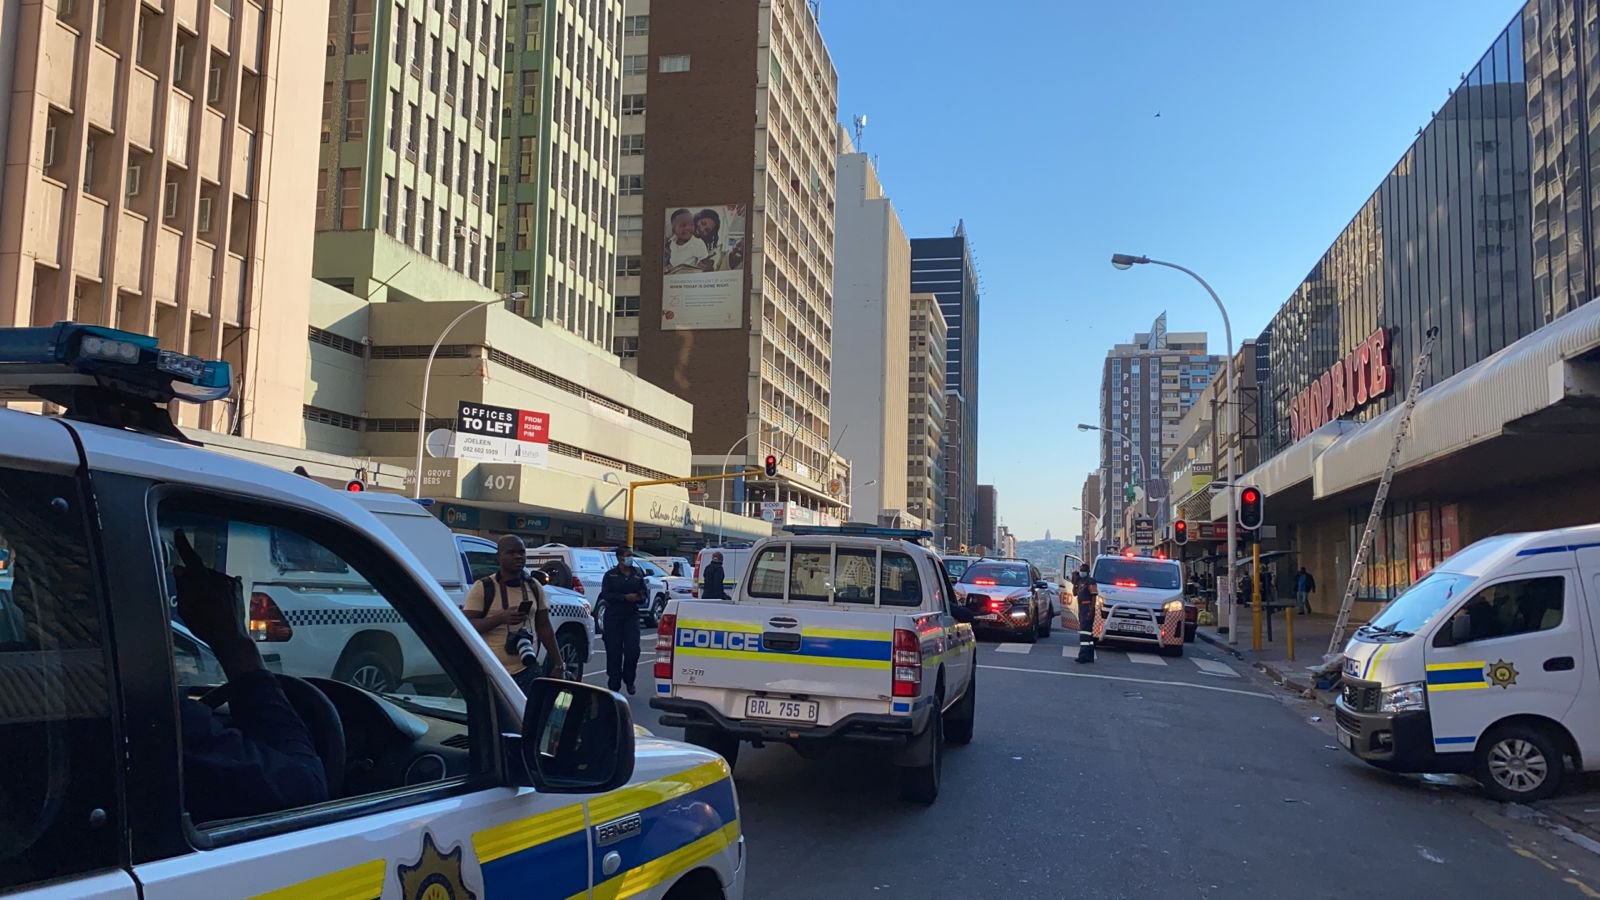 Durban hostage situation 2